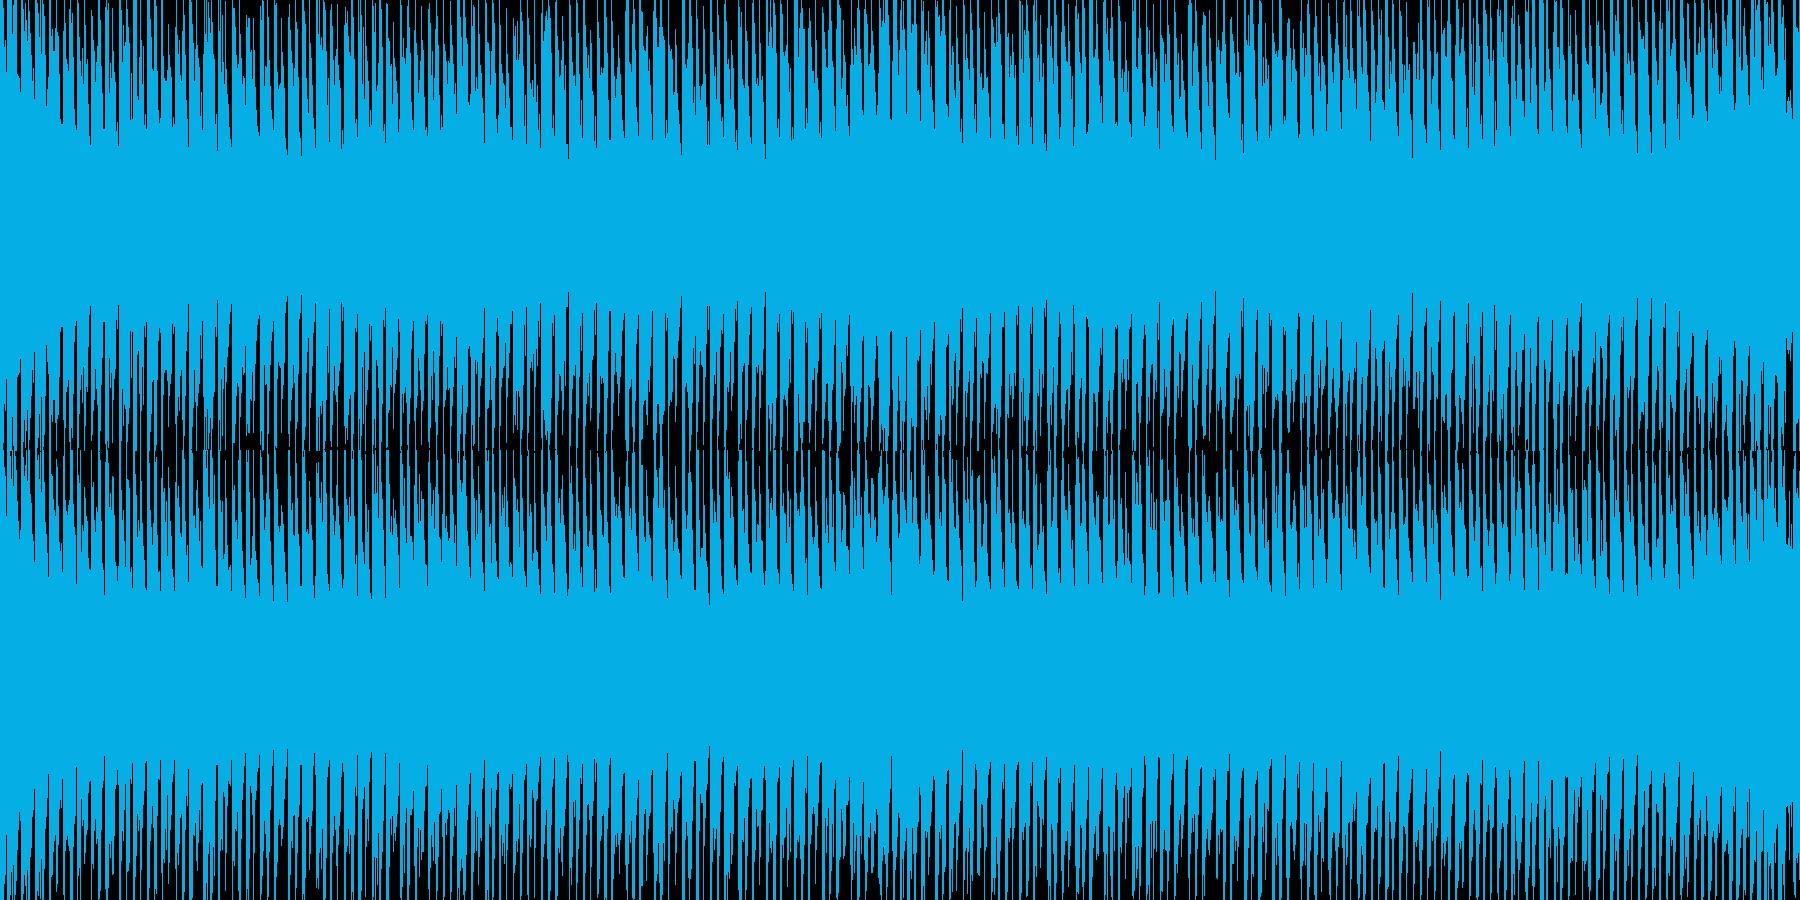 【EDMループ素材】企業・映像制作向きDの再生済みの波形